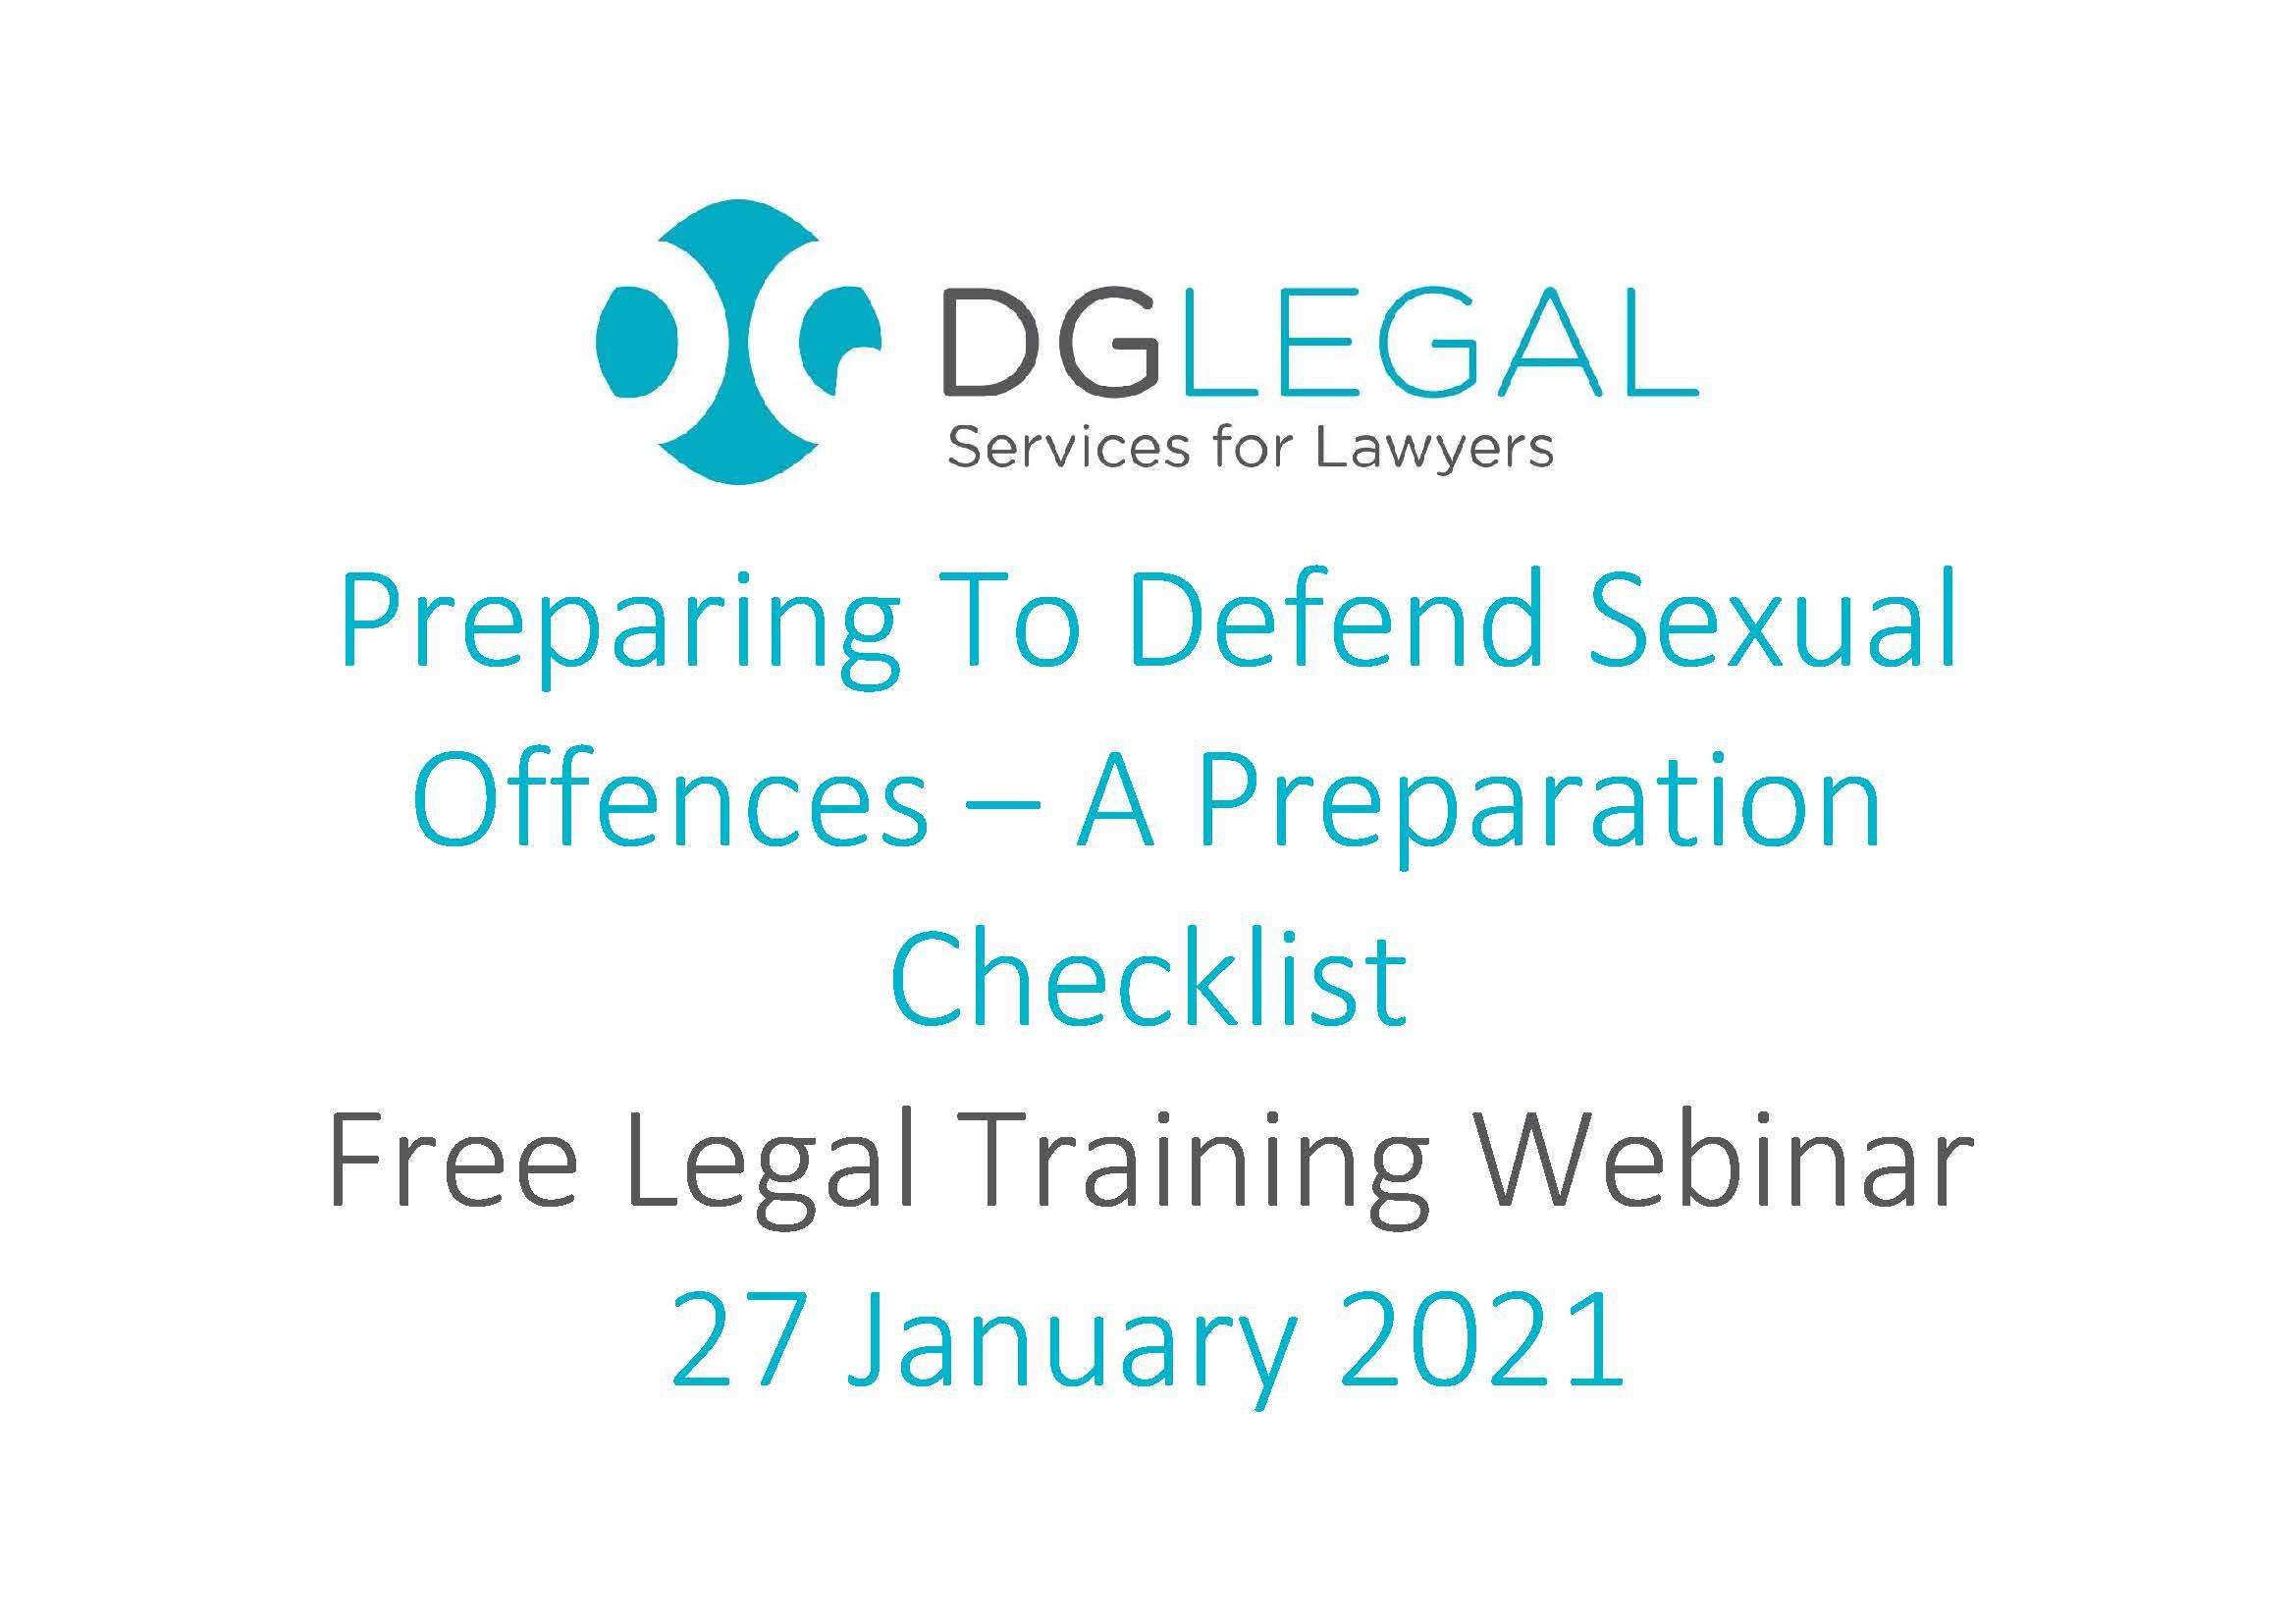 Preparing To Defend Sexual Offences – A Preparation Checklist